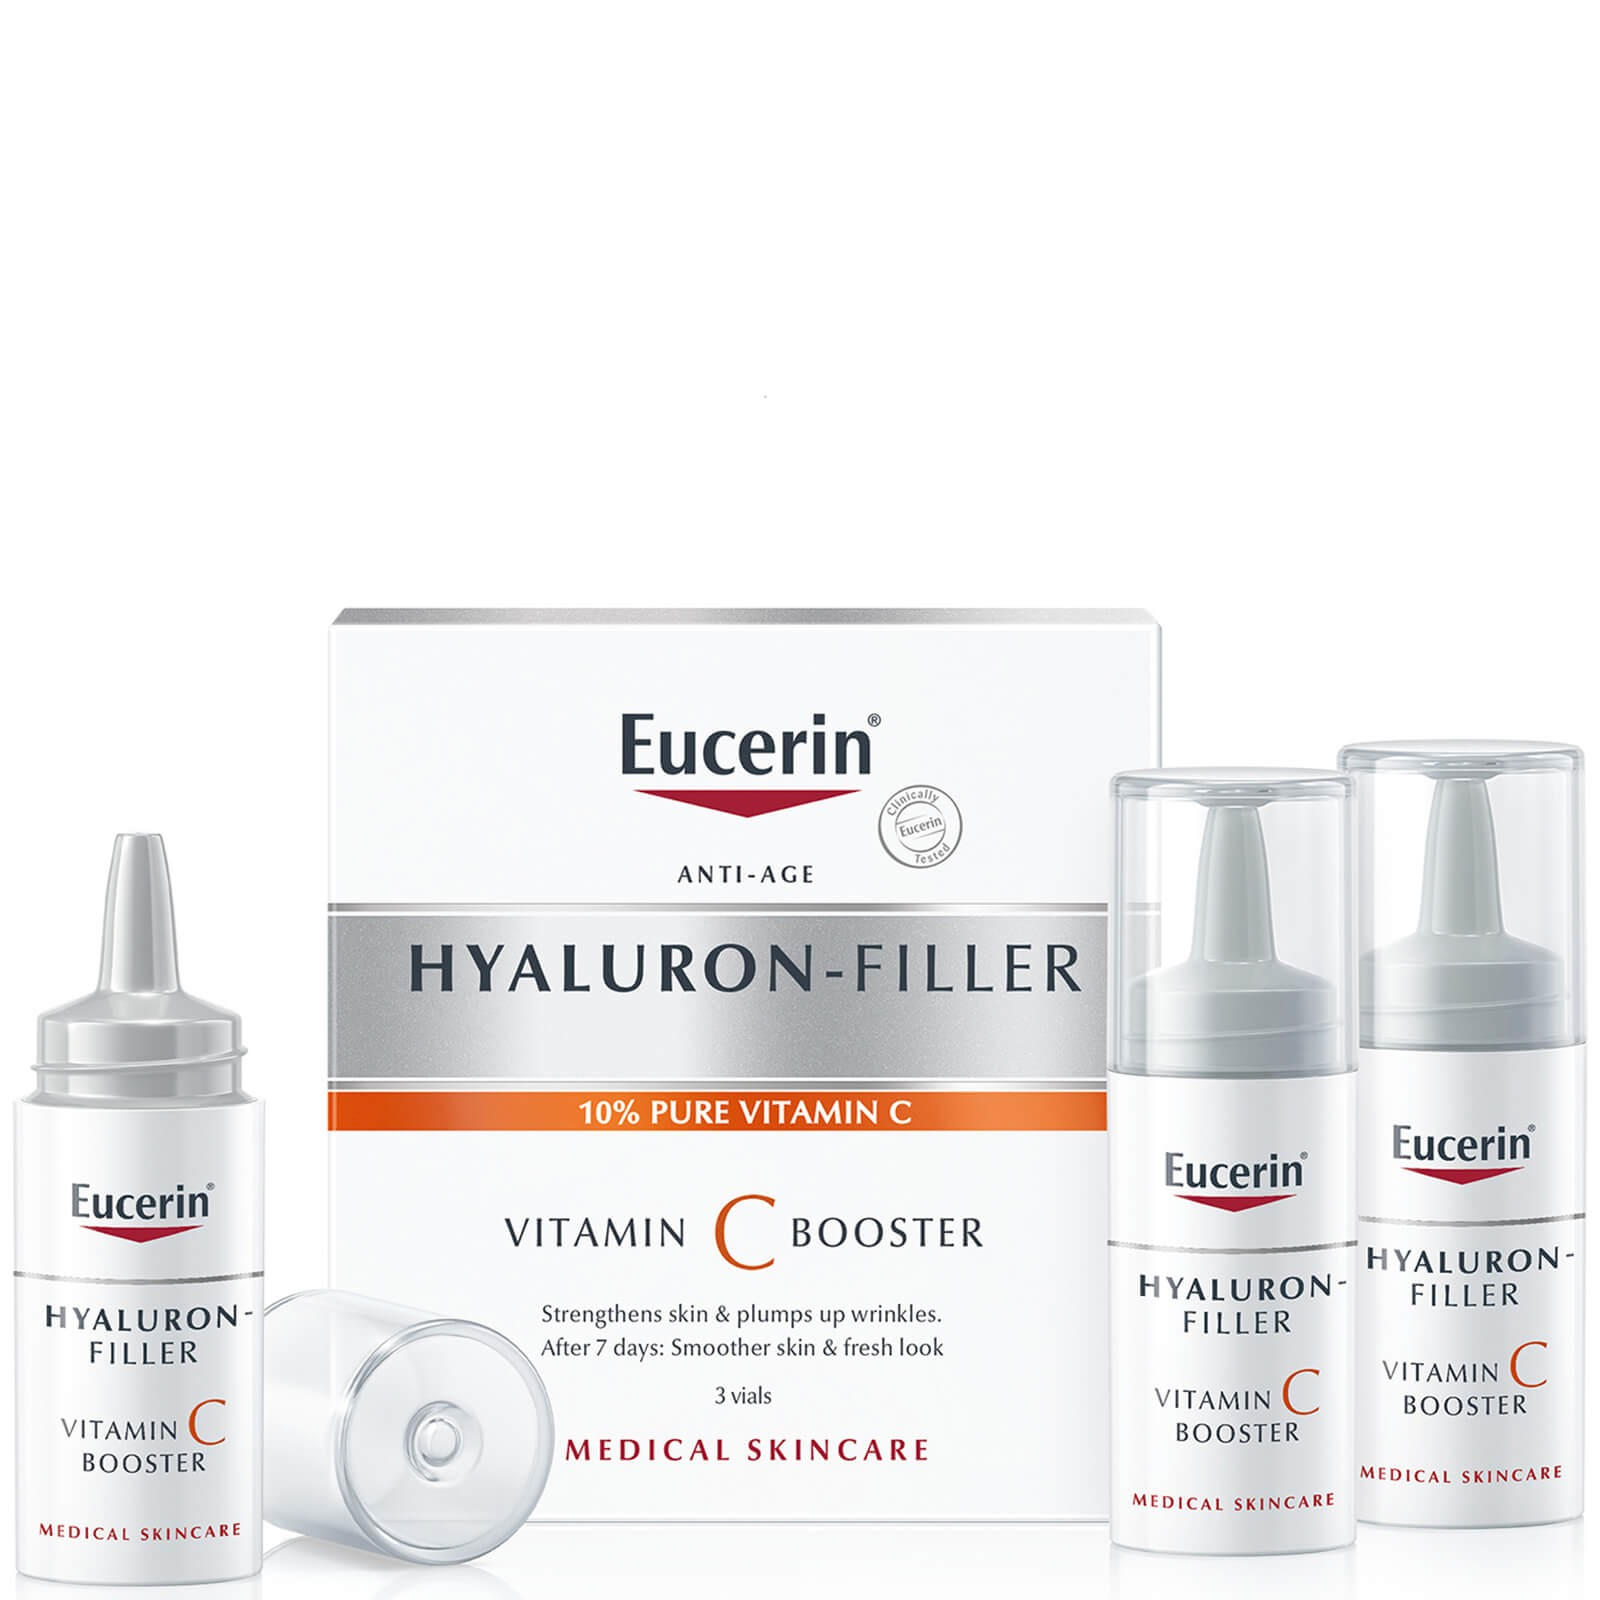 Eucerin Hyaluron-Filler Vitamin C Booster (3 viales)